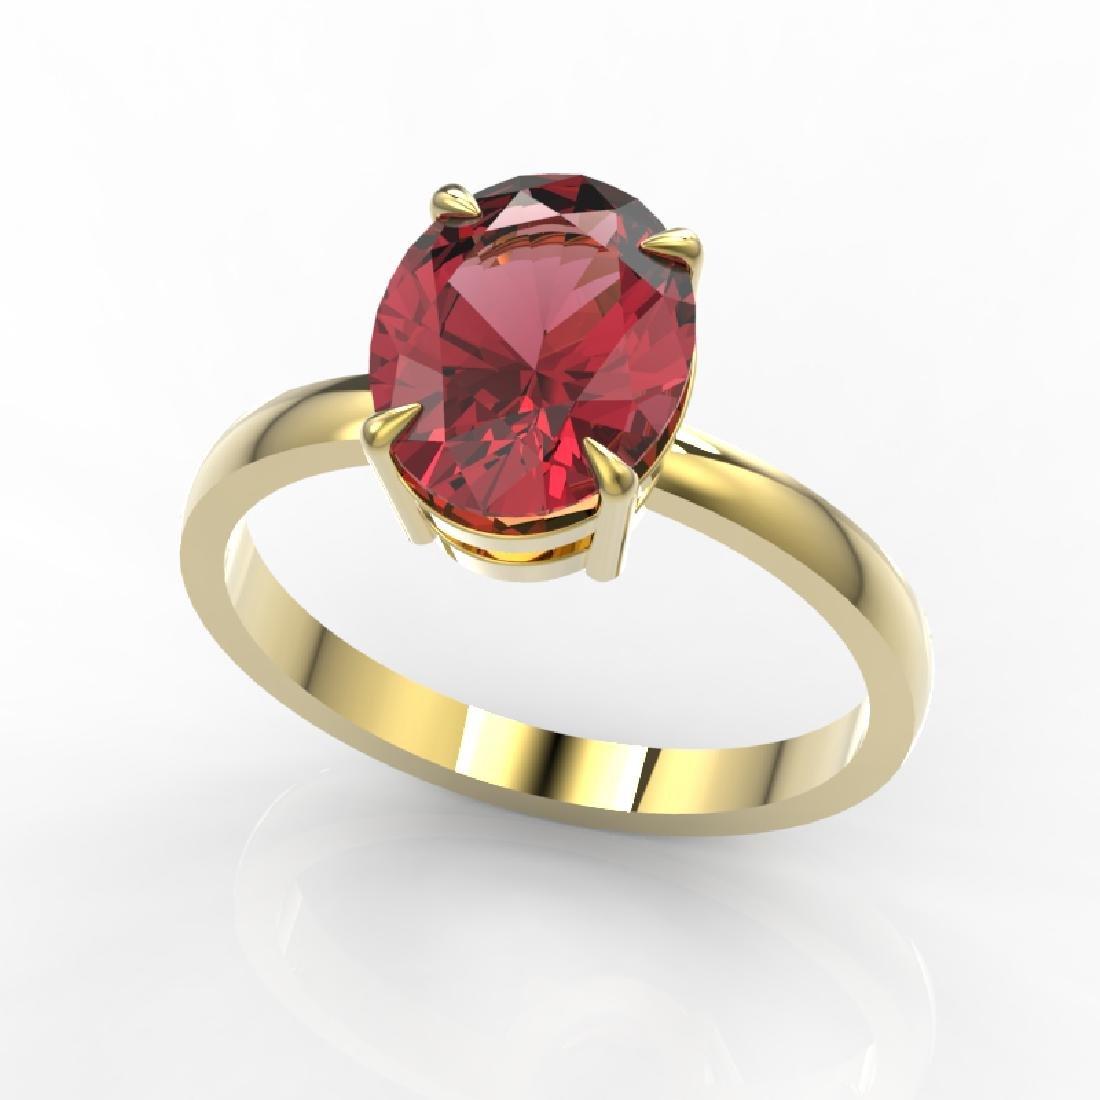 3 CTW Pink Tourmaline Designer Inspired Solitaire Ring - 2